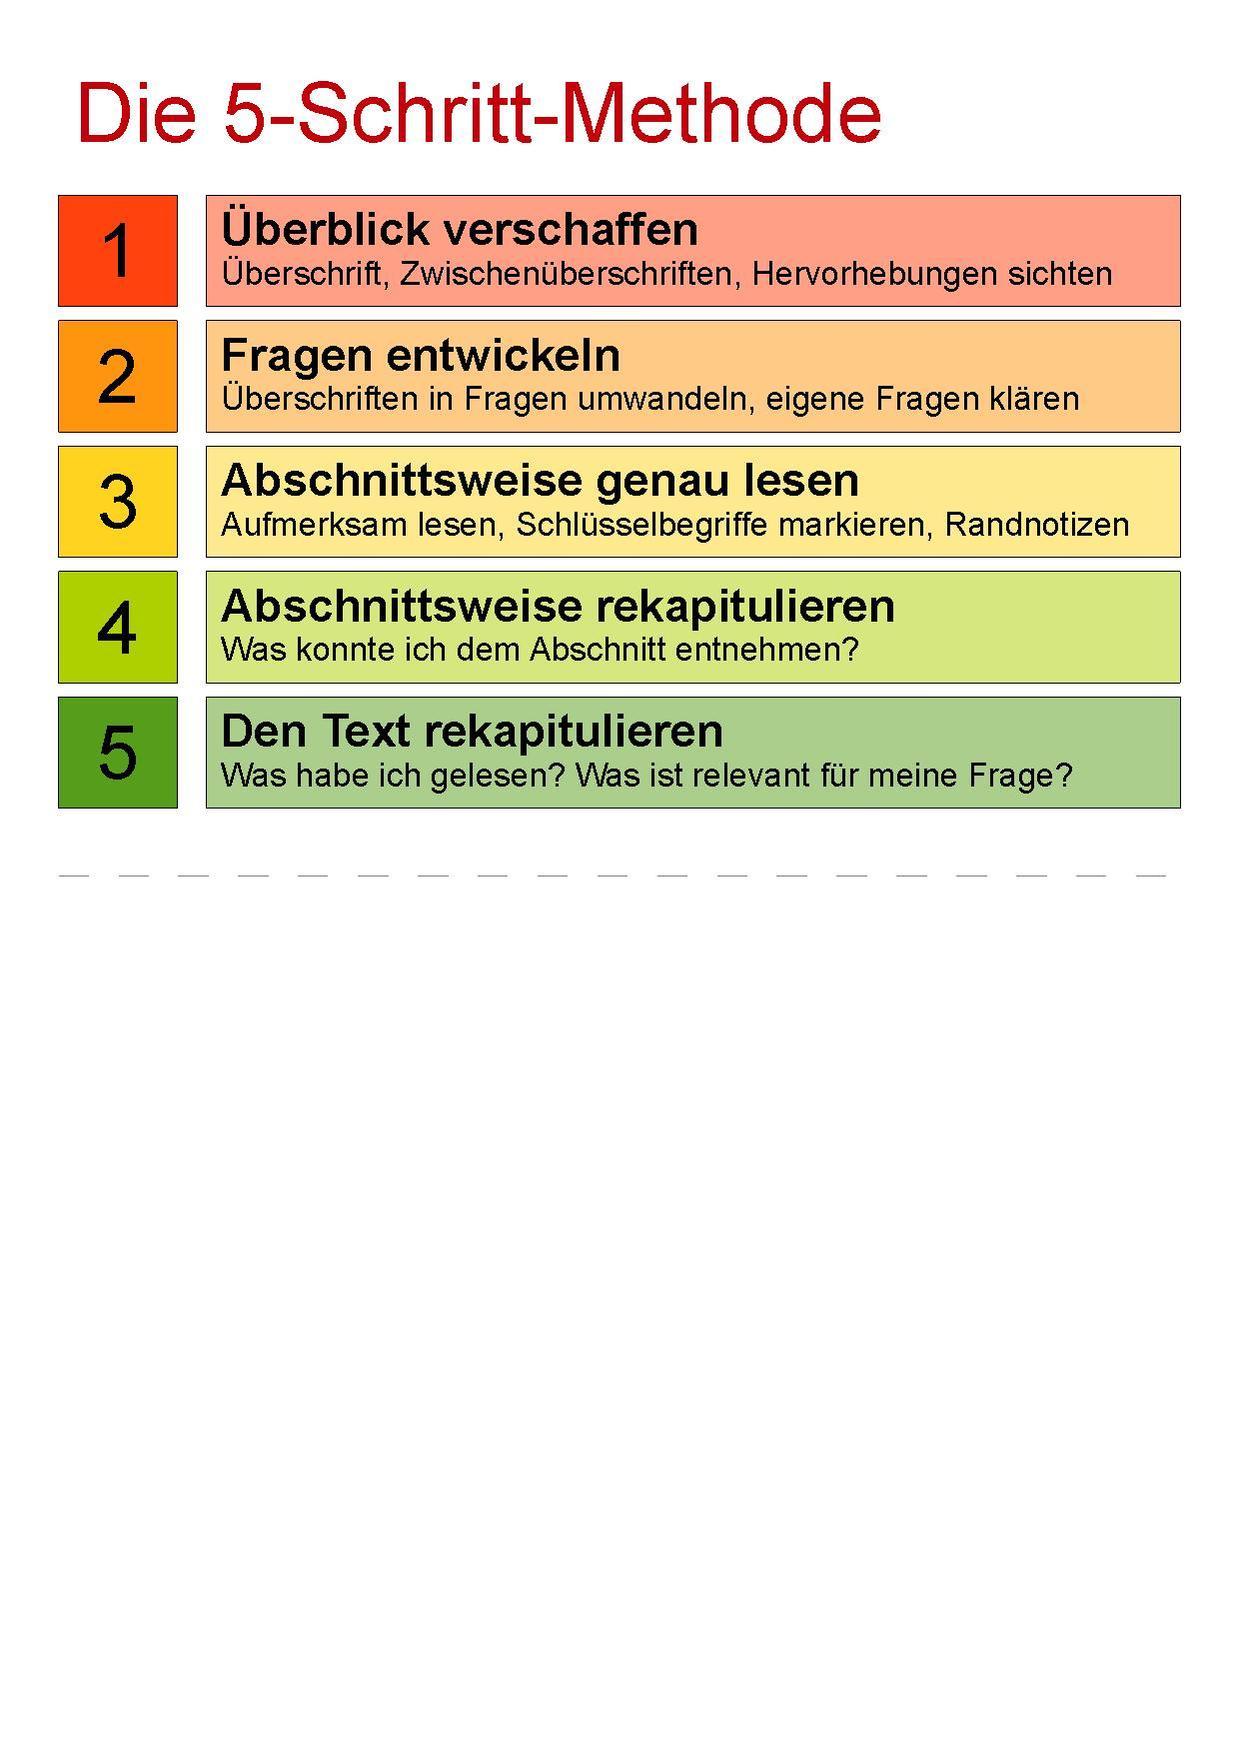 Credit One Application >> File:5-Schritt-Methode.pdf - Wikimedia Commons